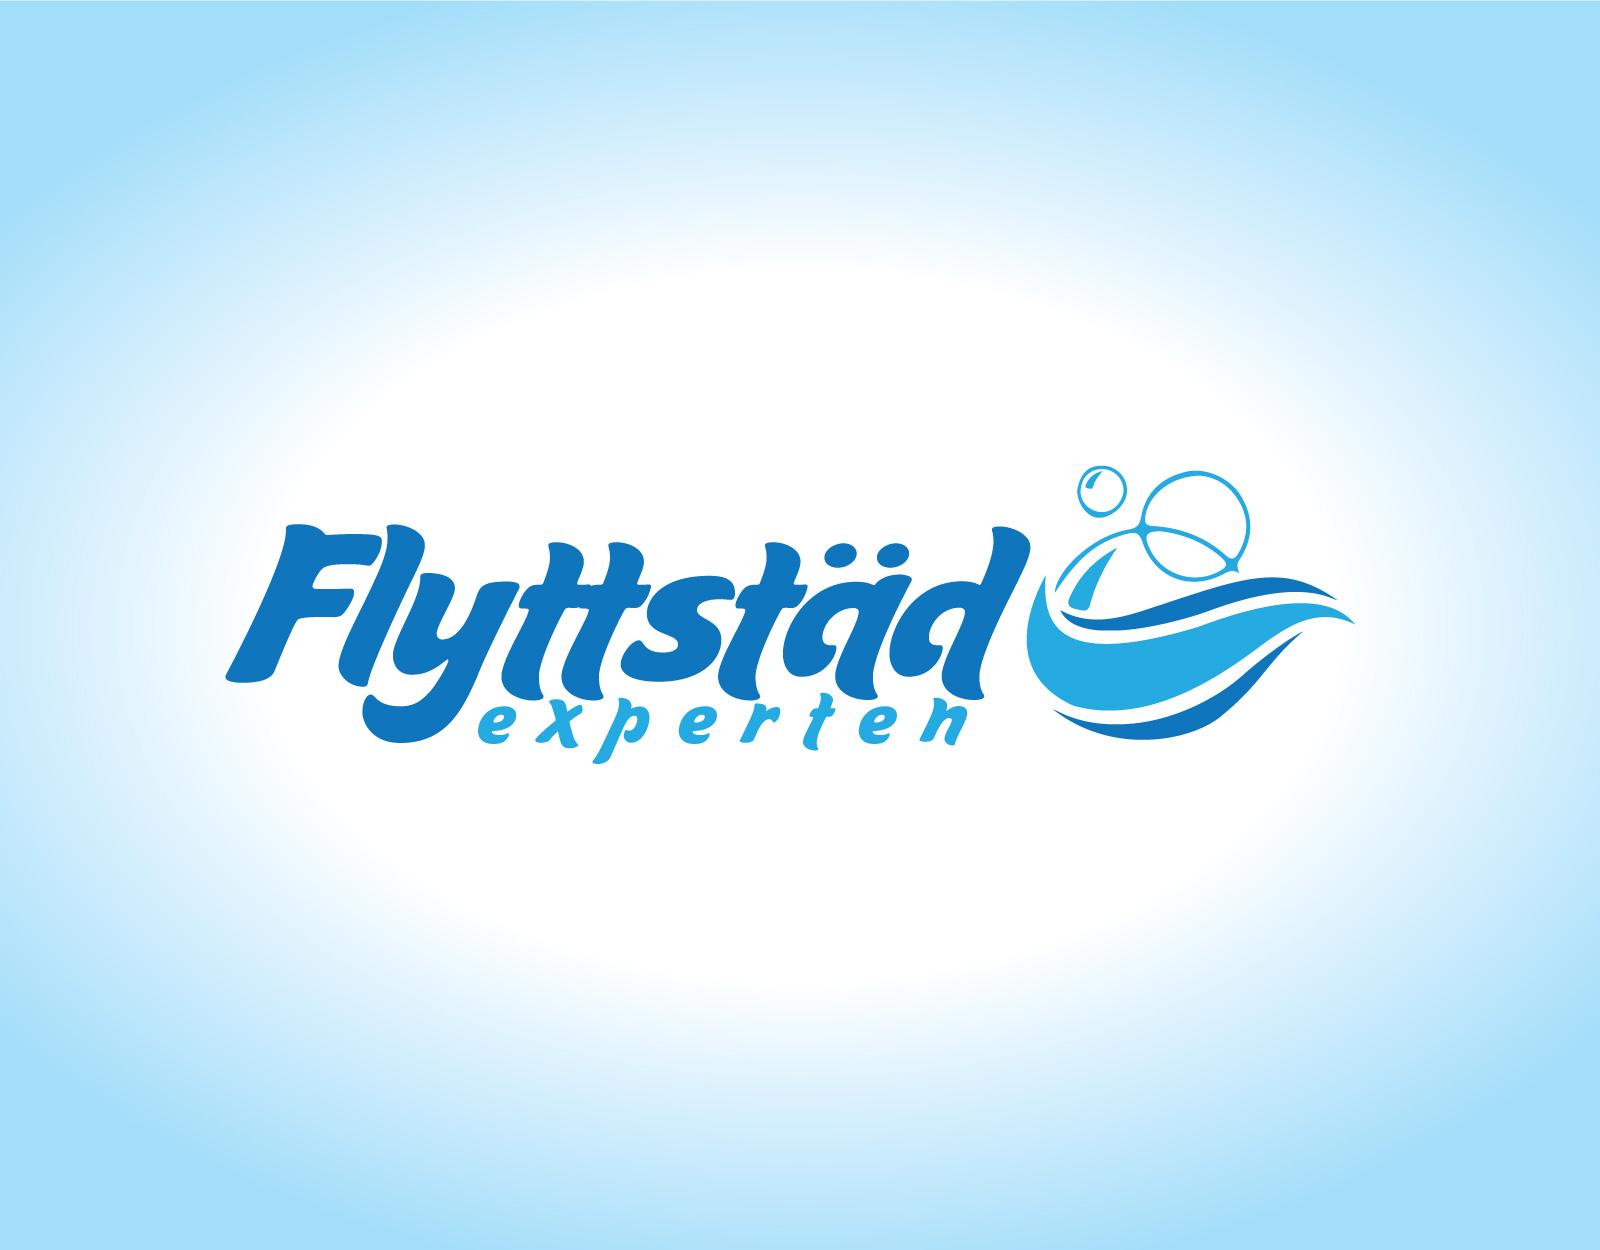 flyttstadexperten logo